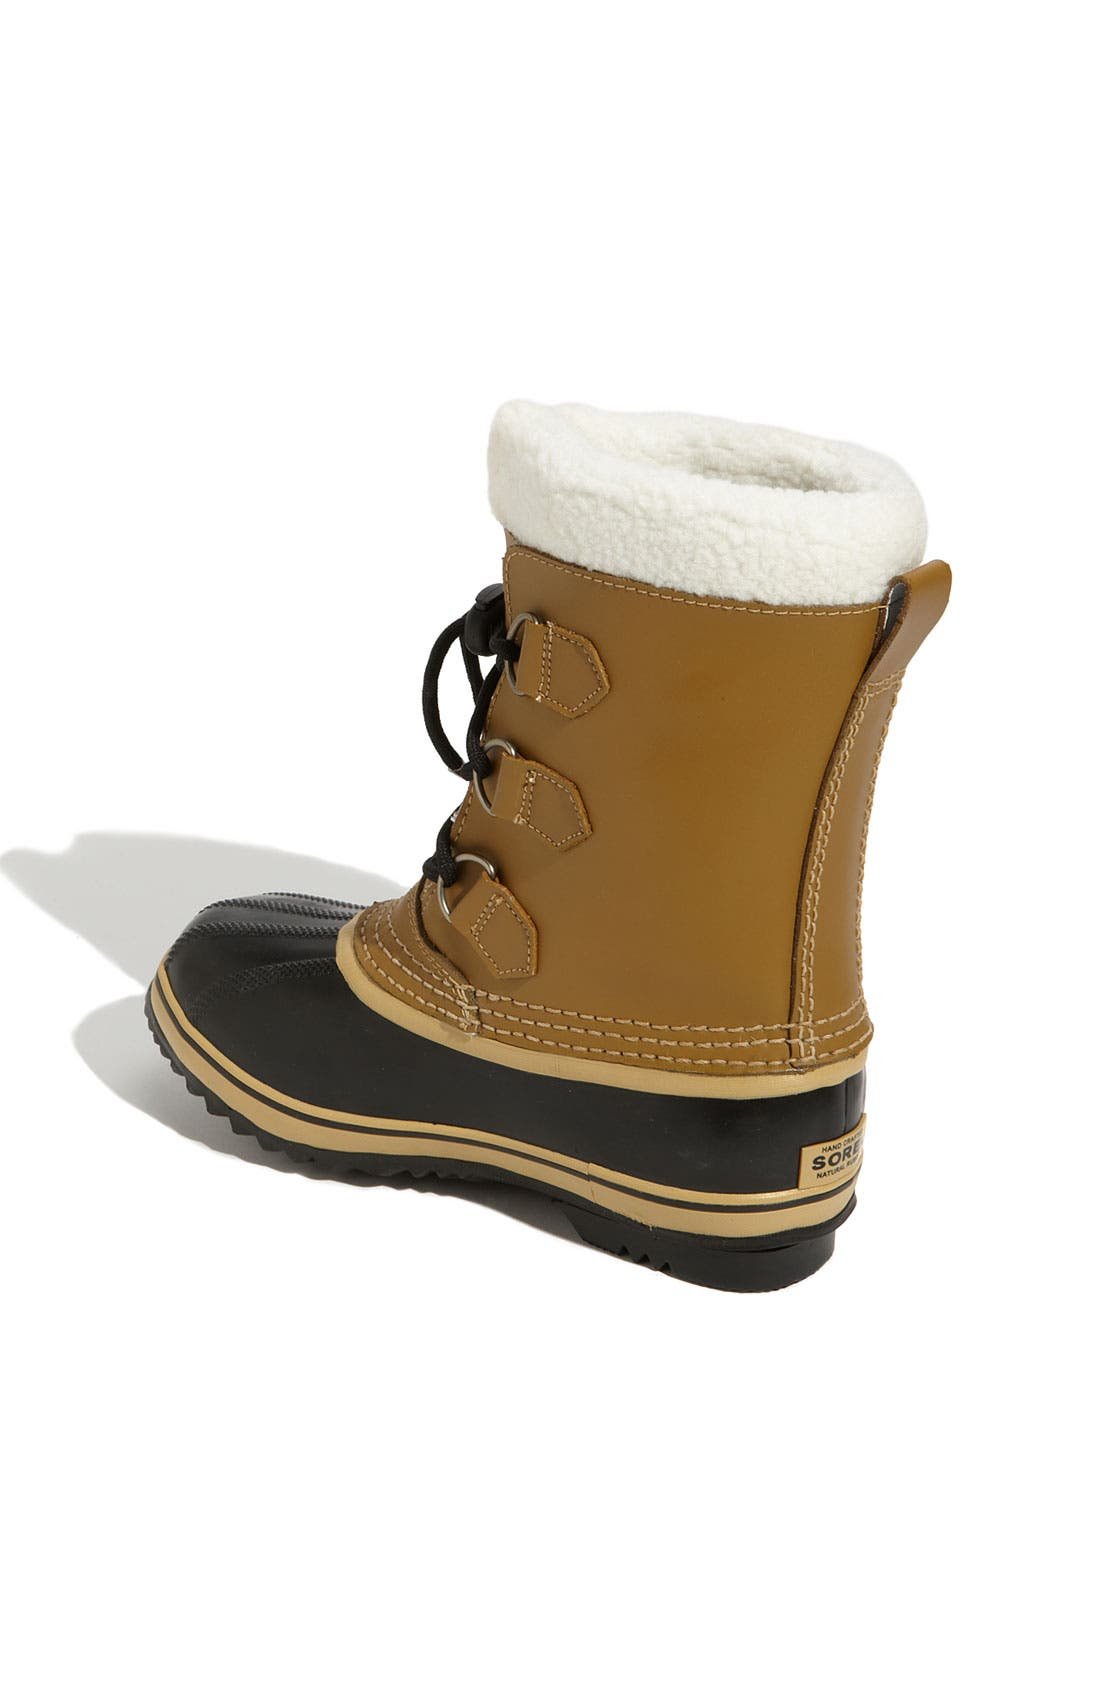 Alternate Image 2  - SOREL 'Yoot Pac' Weatherproof Boot (Toddler, Little Kid & Big Kid)